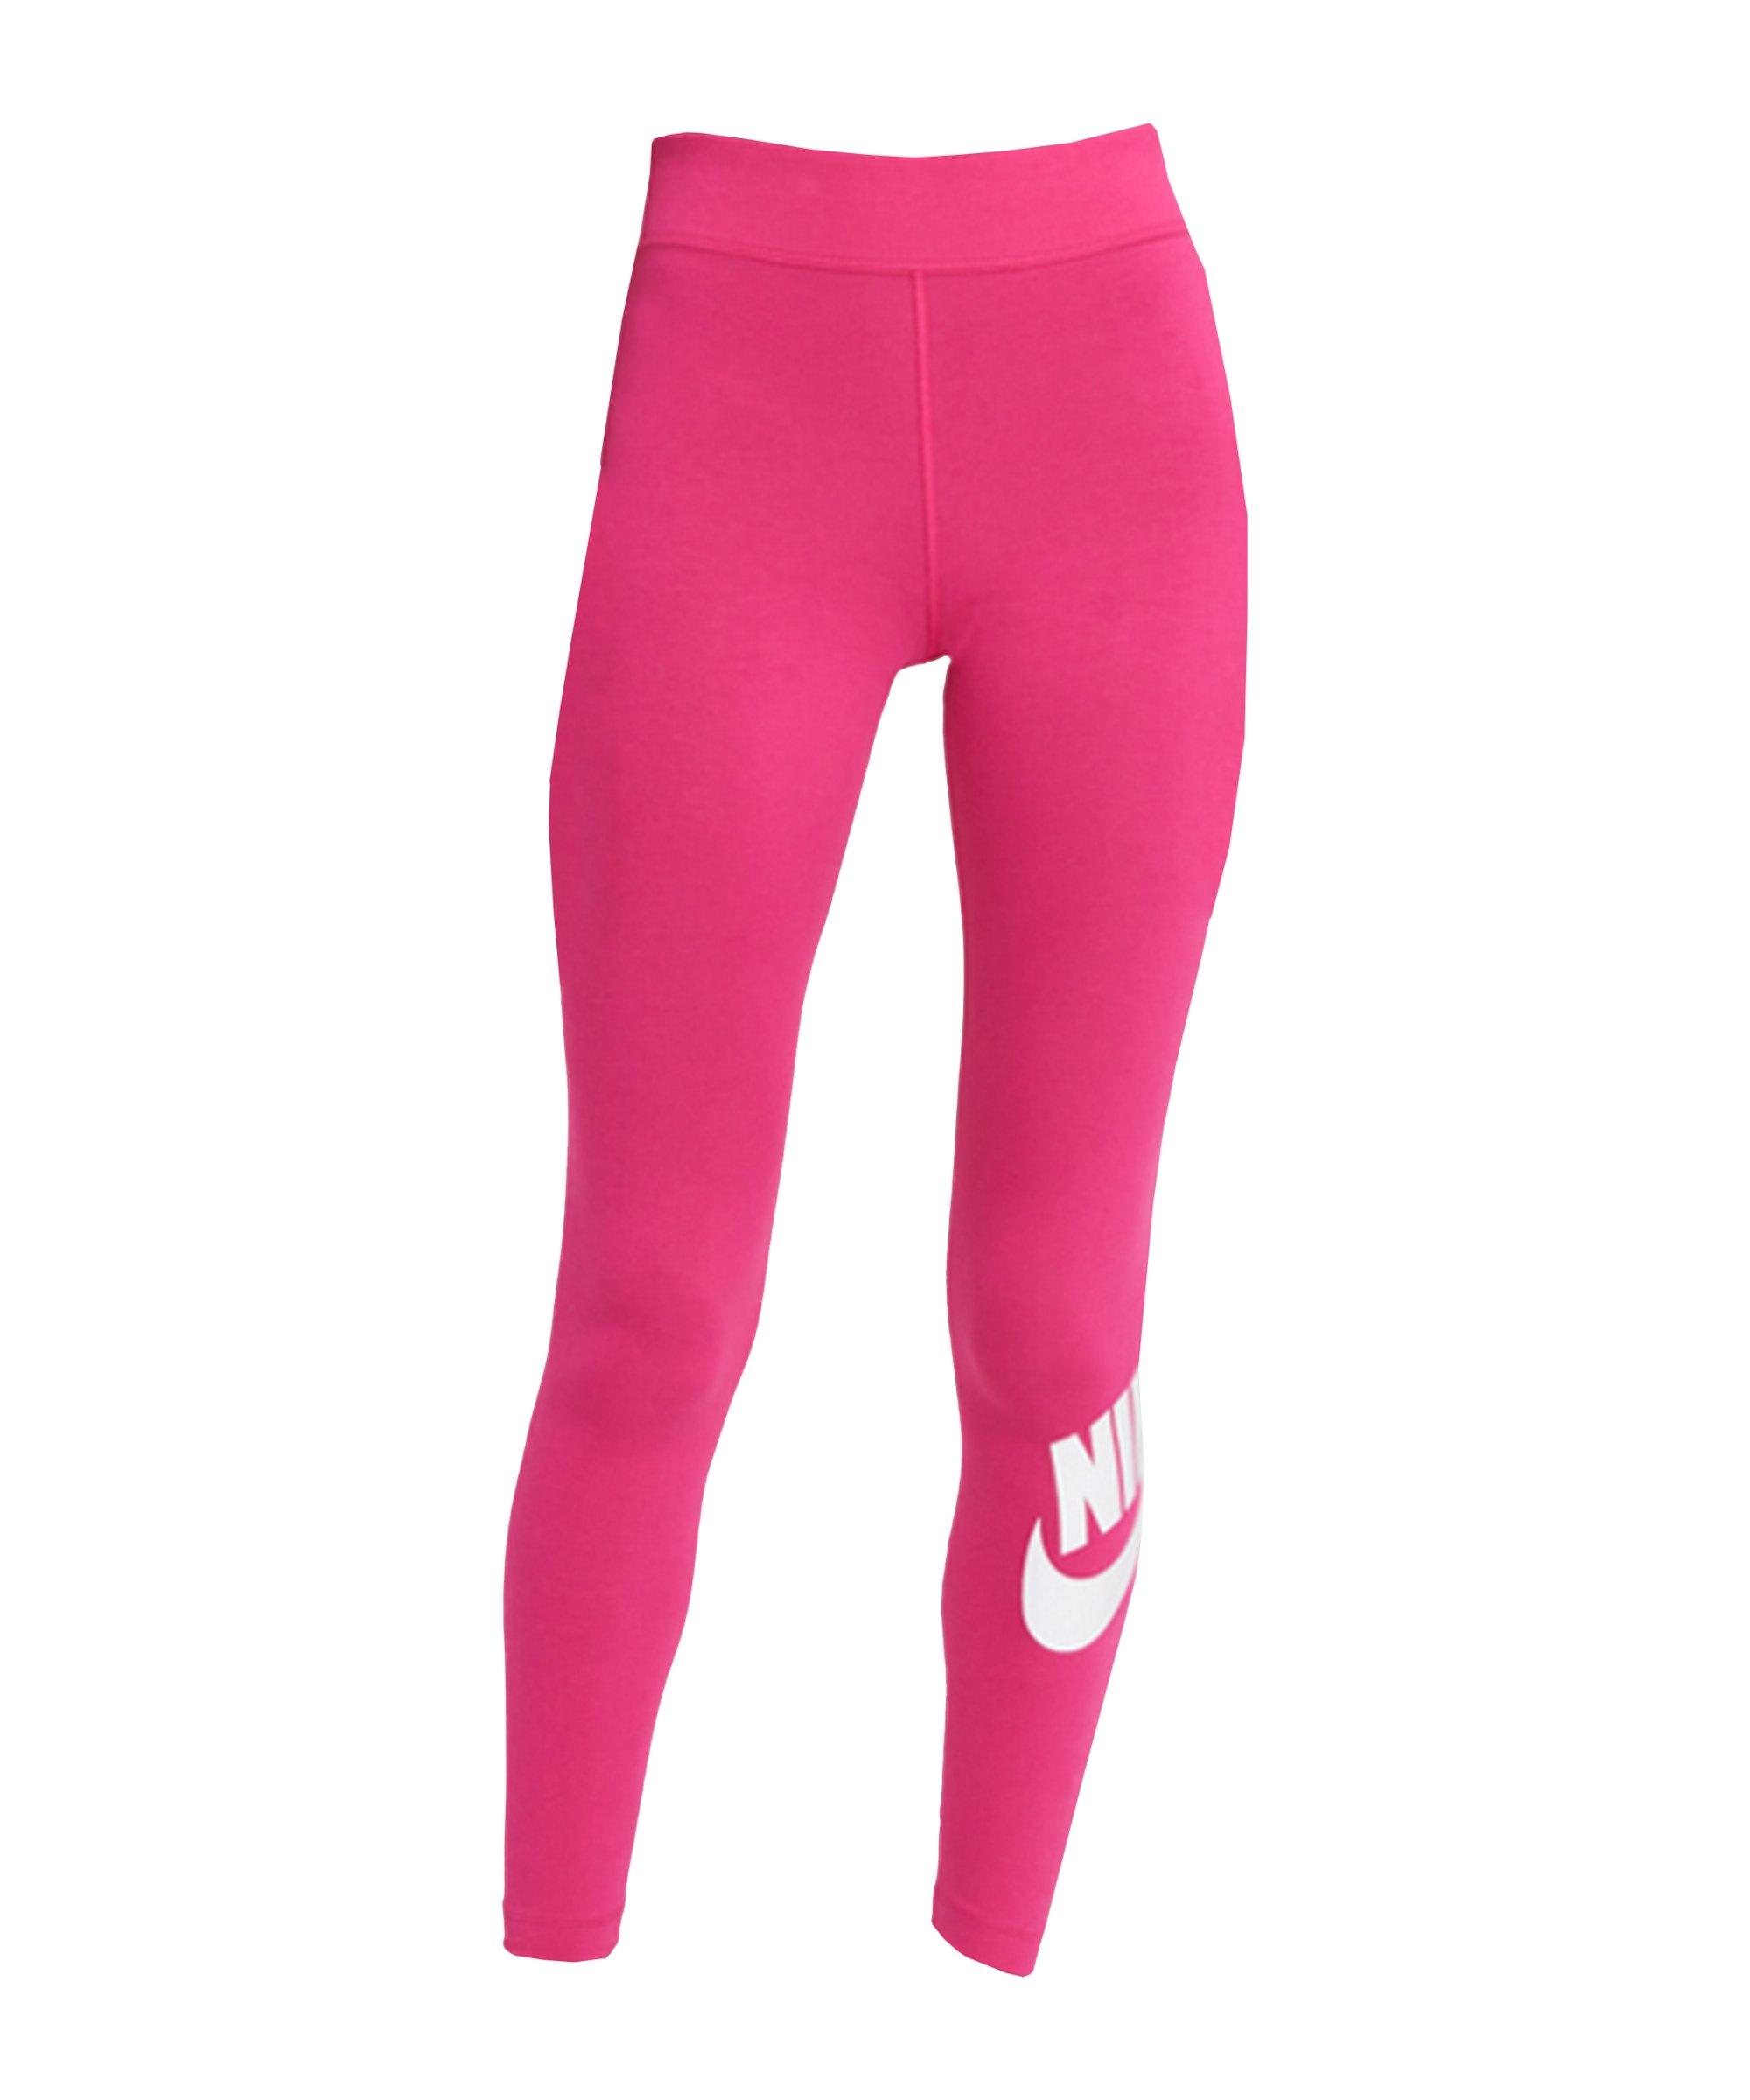 Nike Essentials Leggings Damen Pink Weiss F615 - pink